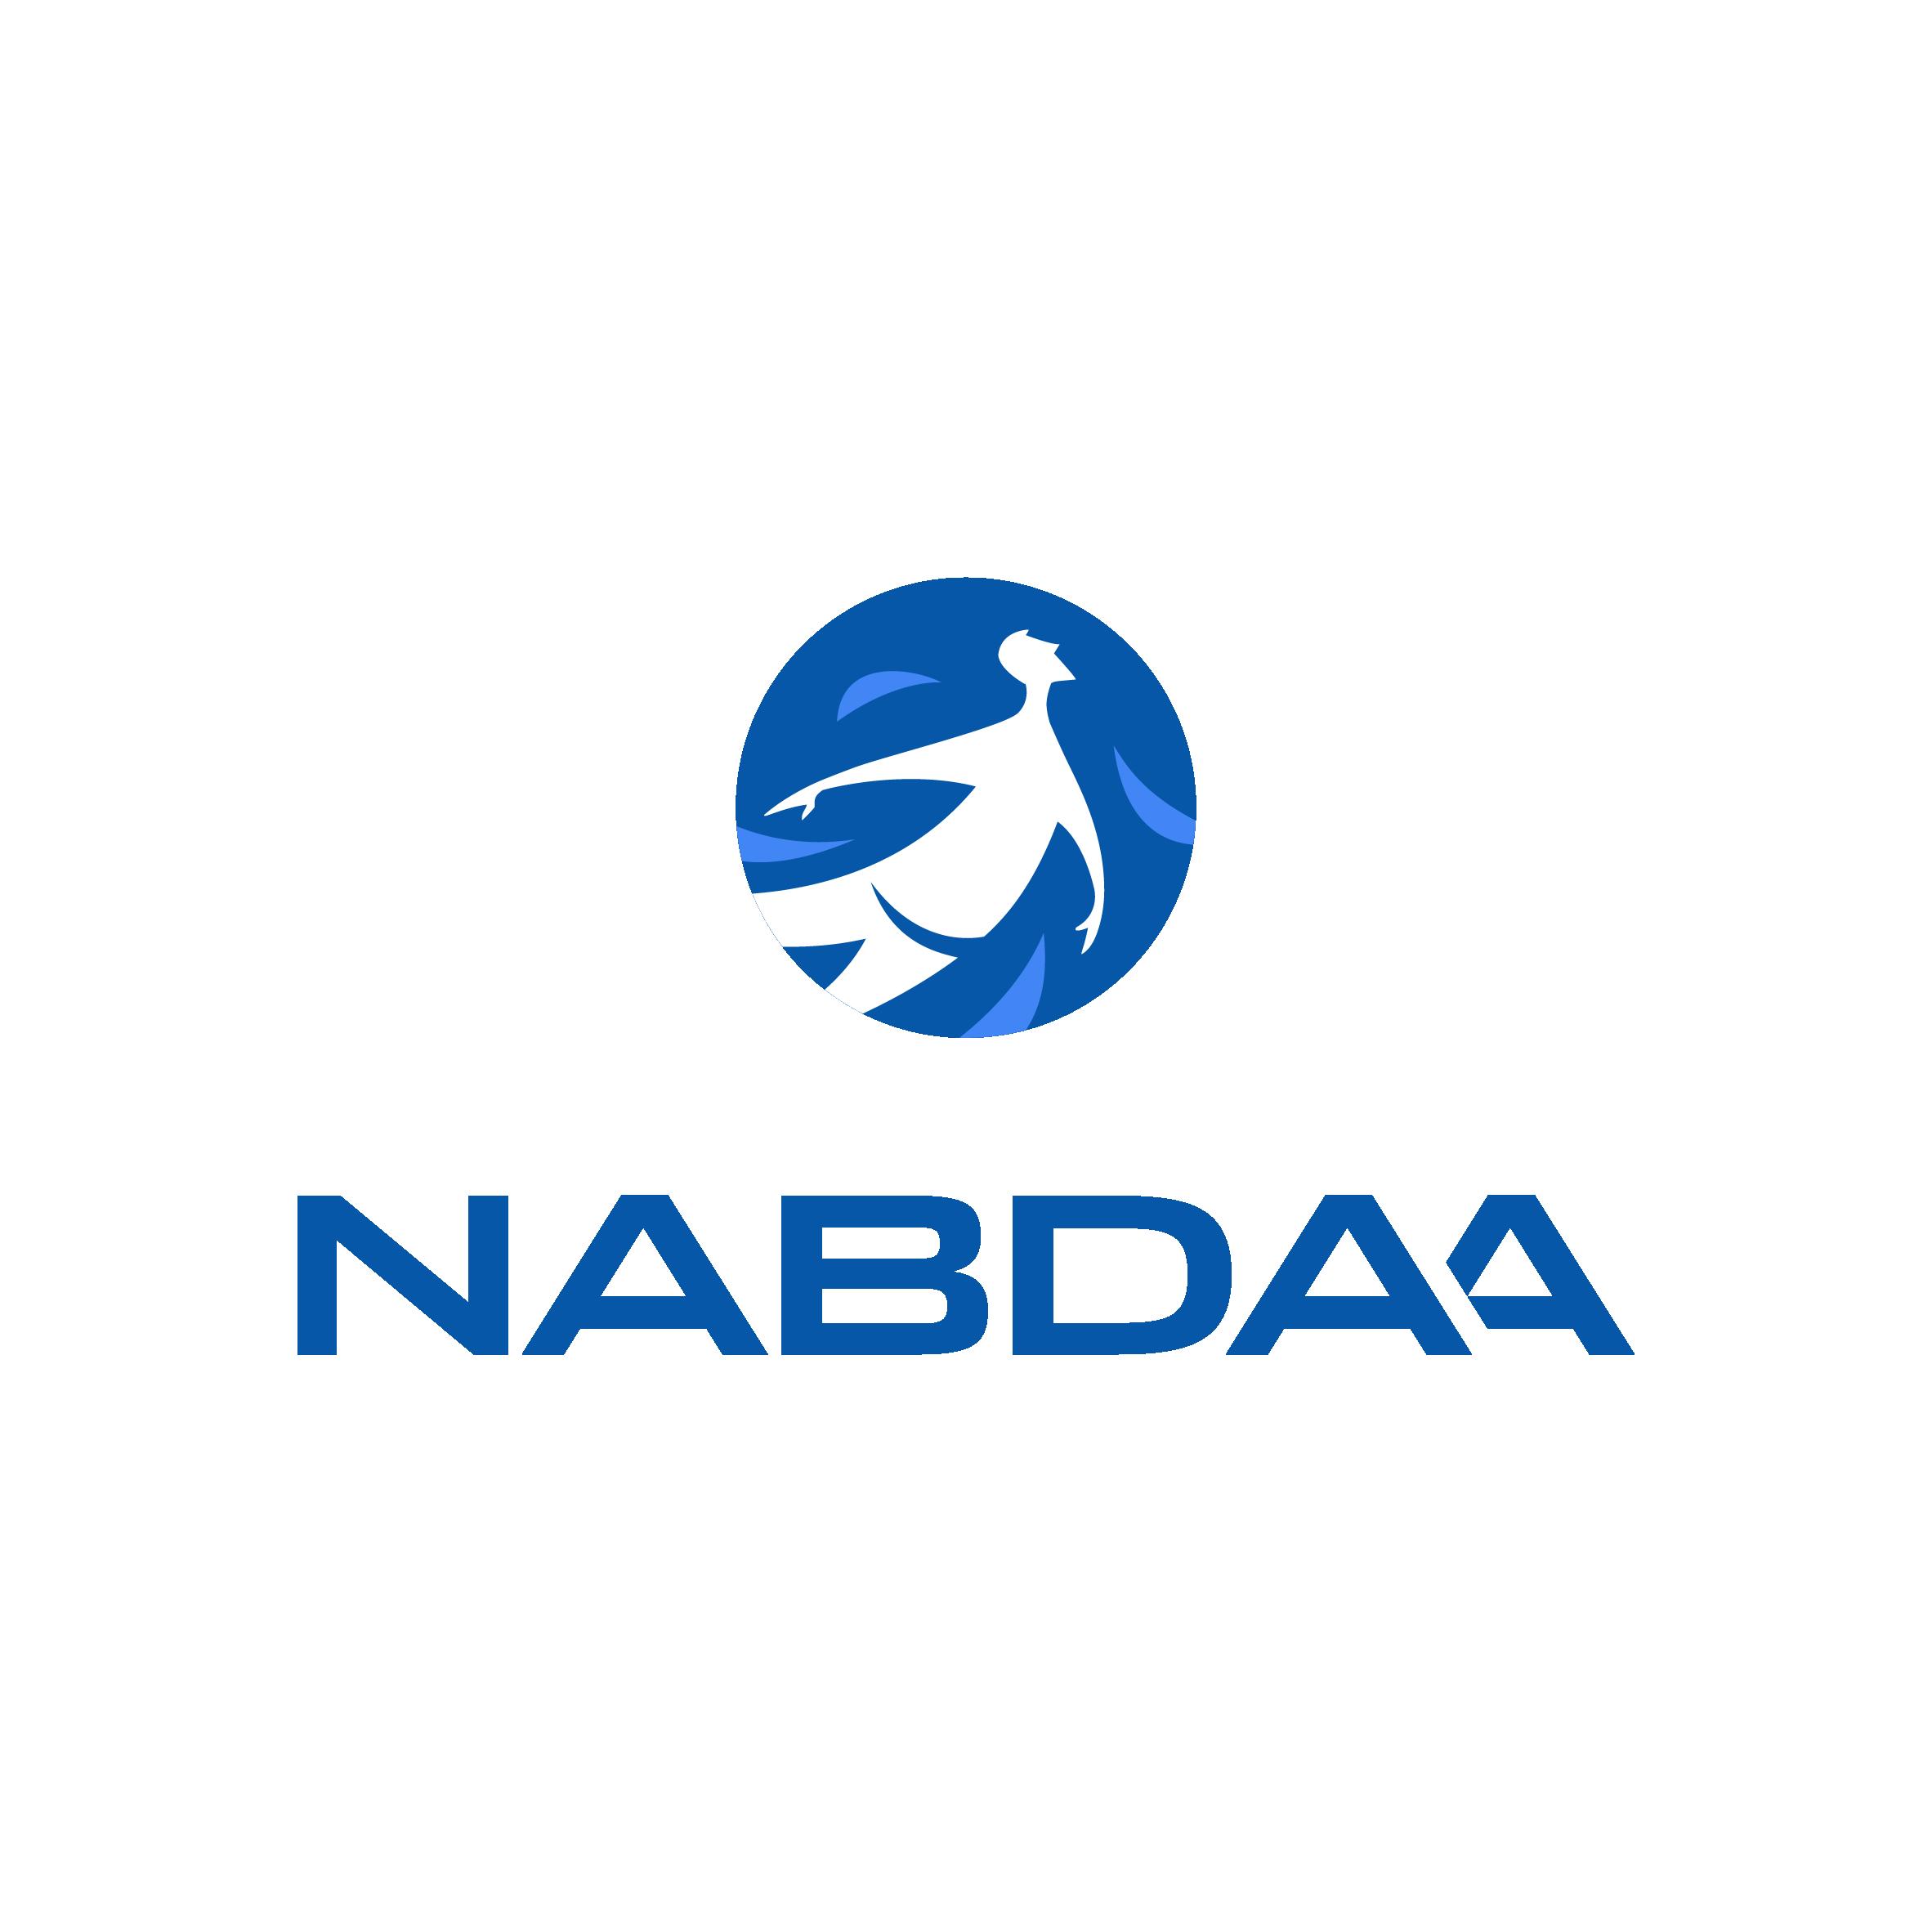 nabdaa-Logo-Transparent (1).png